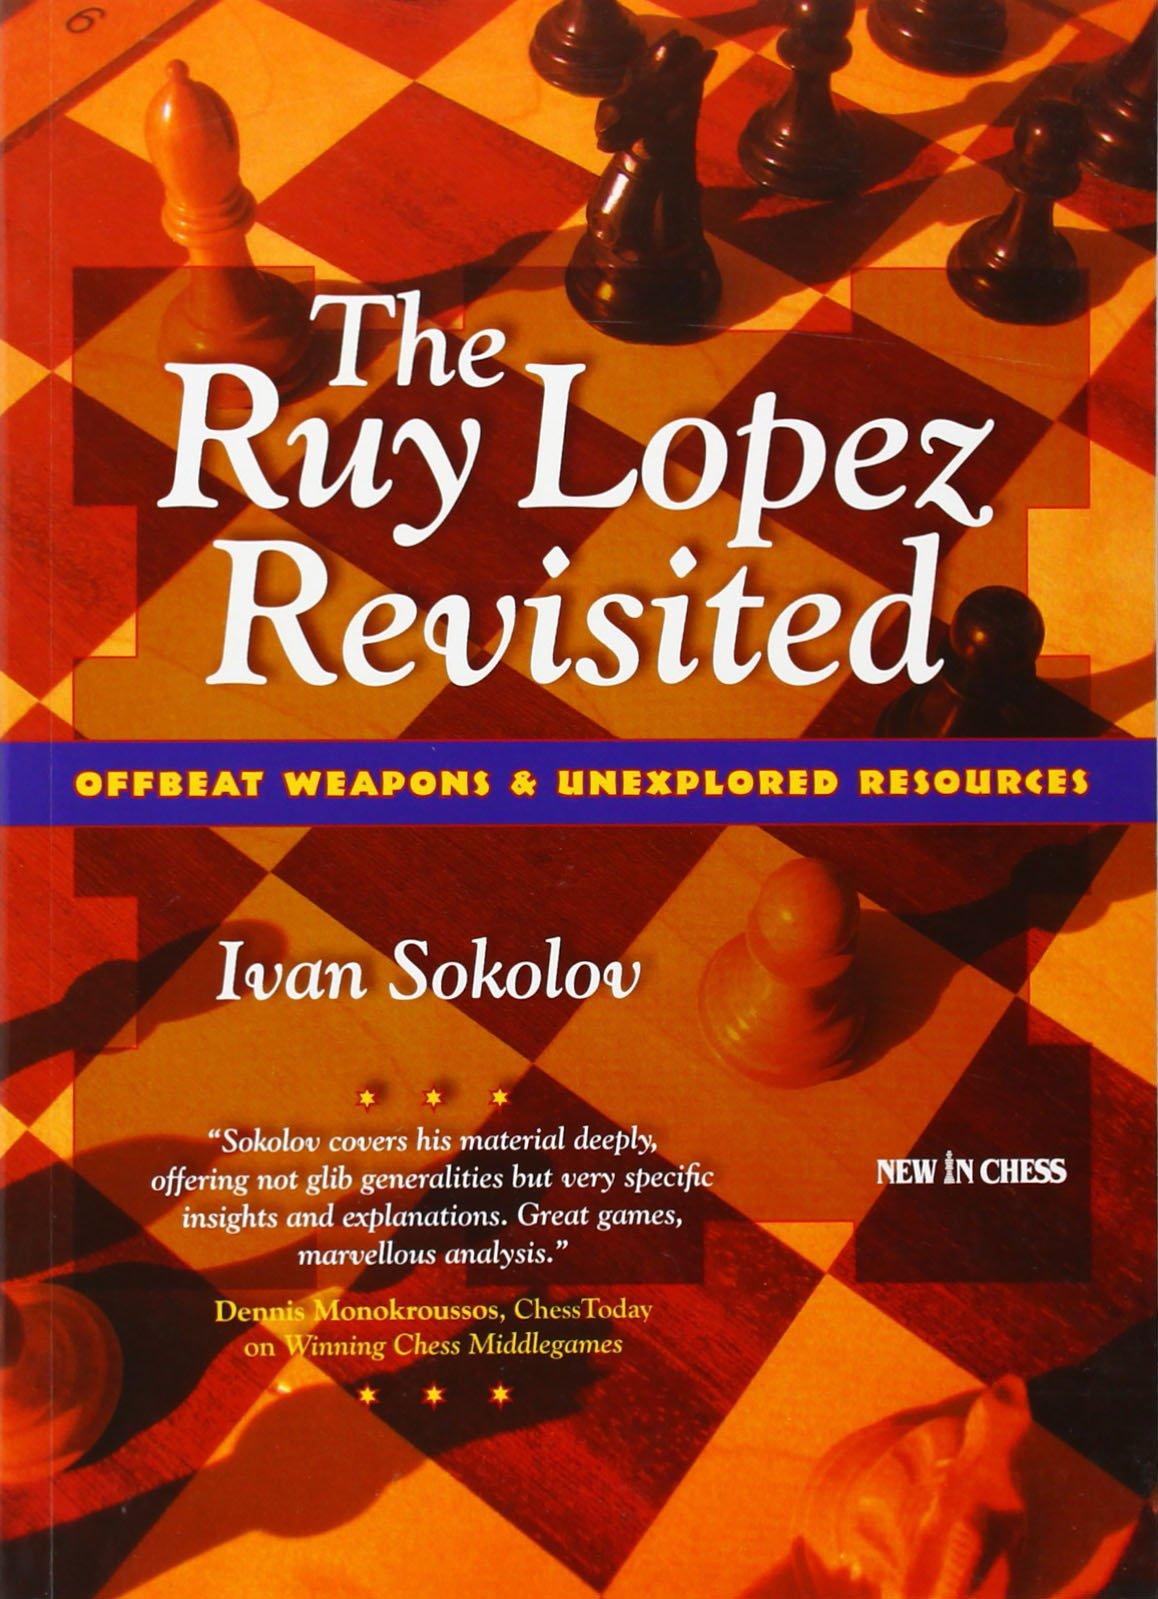 Ivan Sokolov_Ruy Lopez Revisited_Offbeat & Unexplored resou.. 71Cs8OTQFtL